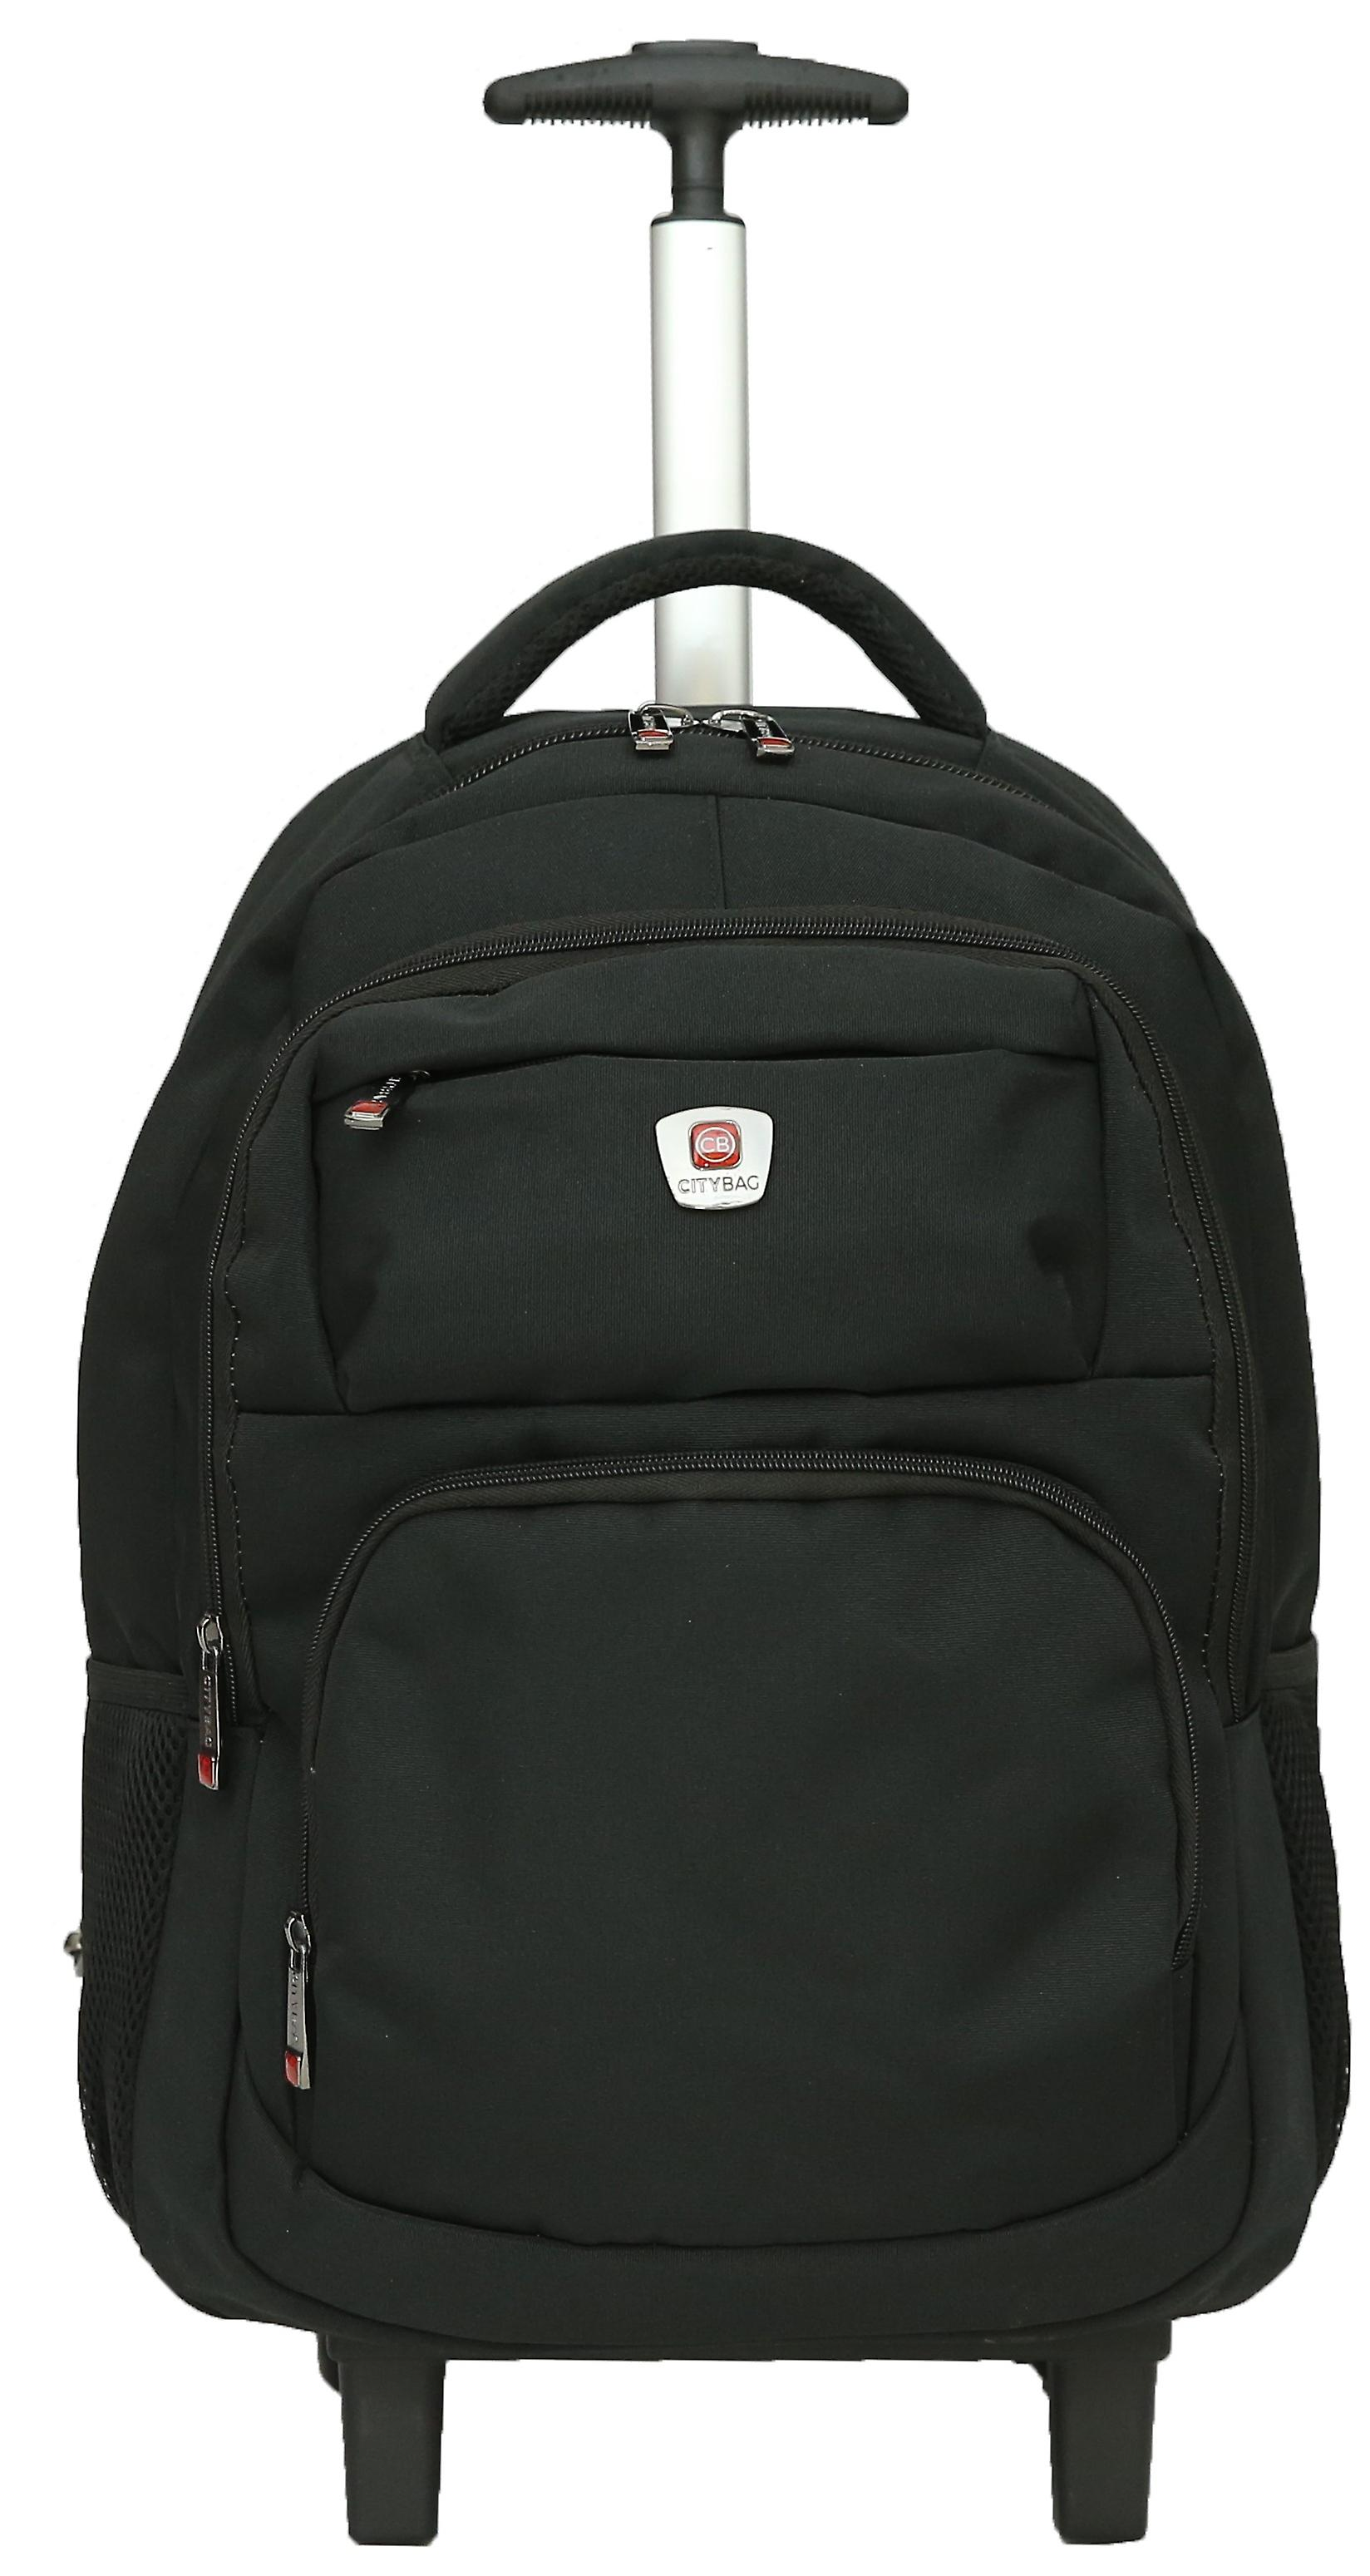 City Bag Hybrid Backpack On Wheels Laptop Trolley Wheeled Rolling 15 6 Computer Bag Hand Luggage Fruugo Us